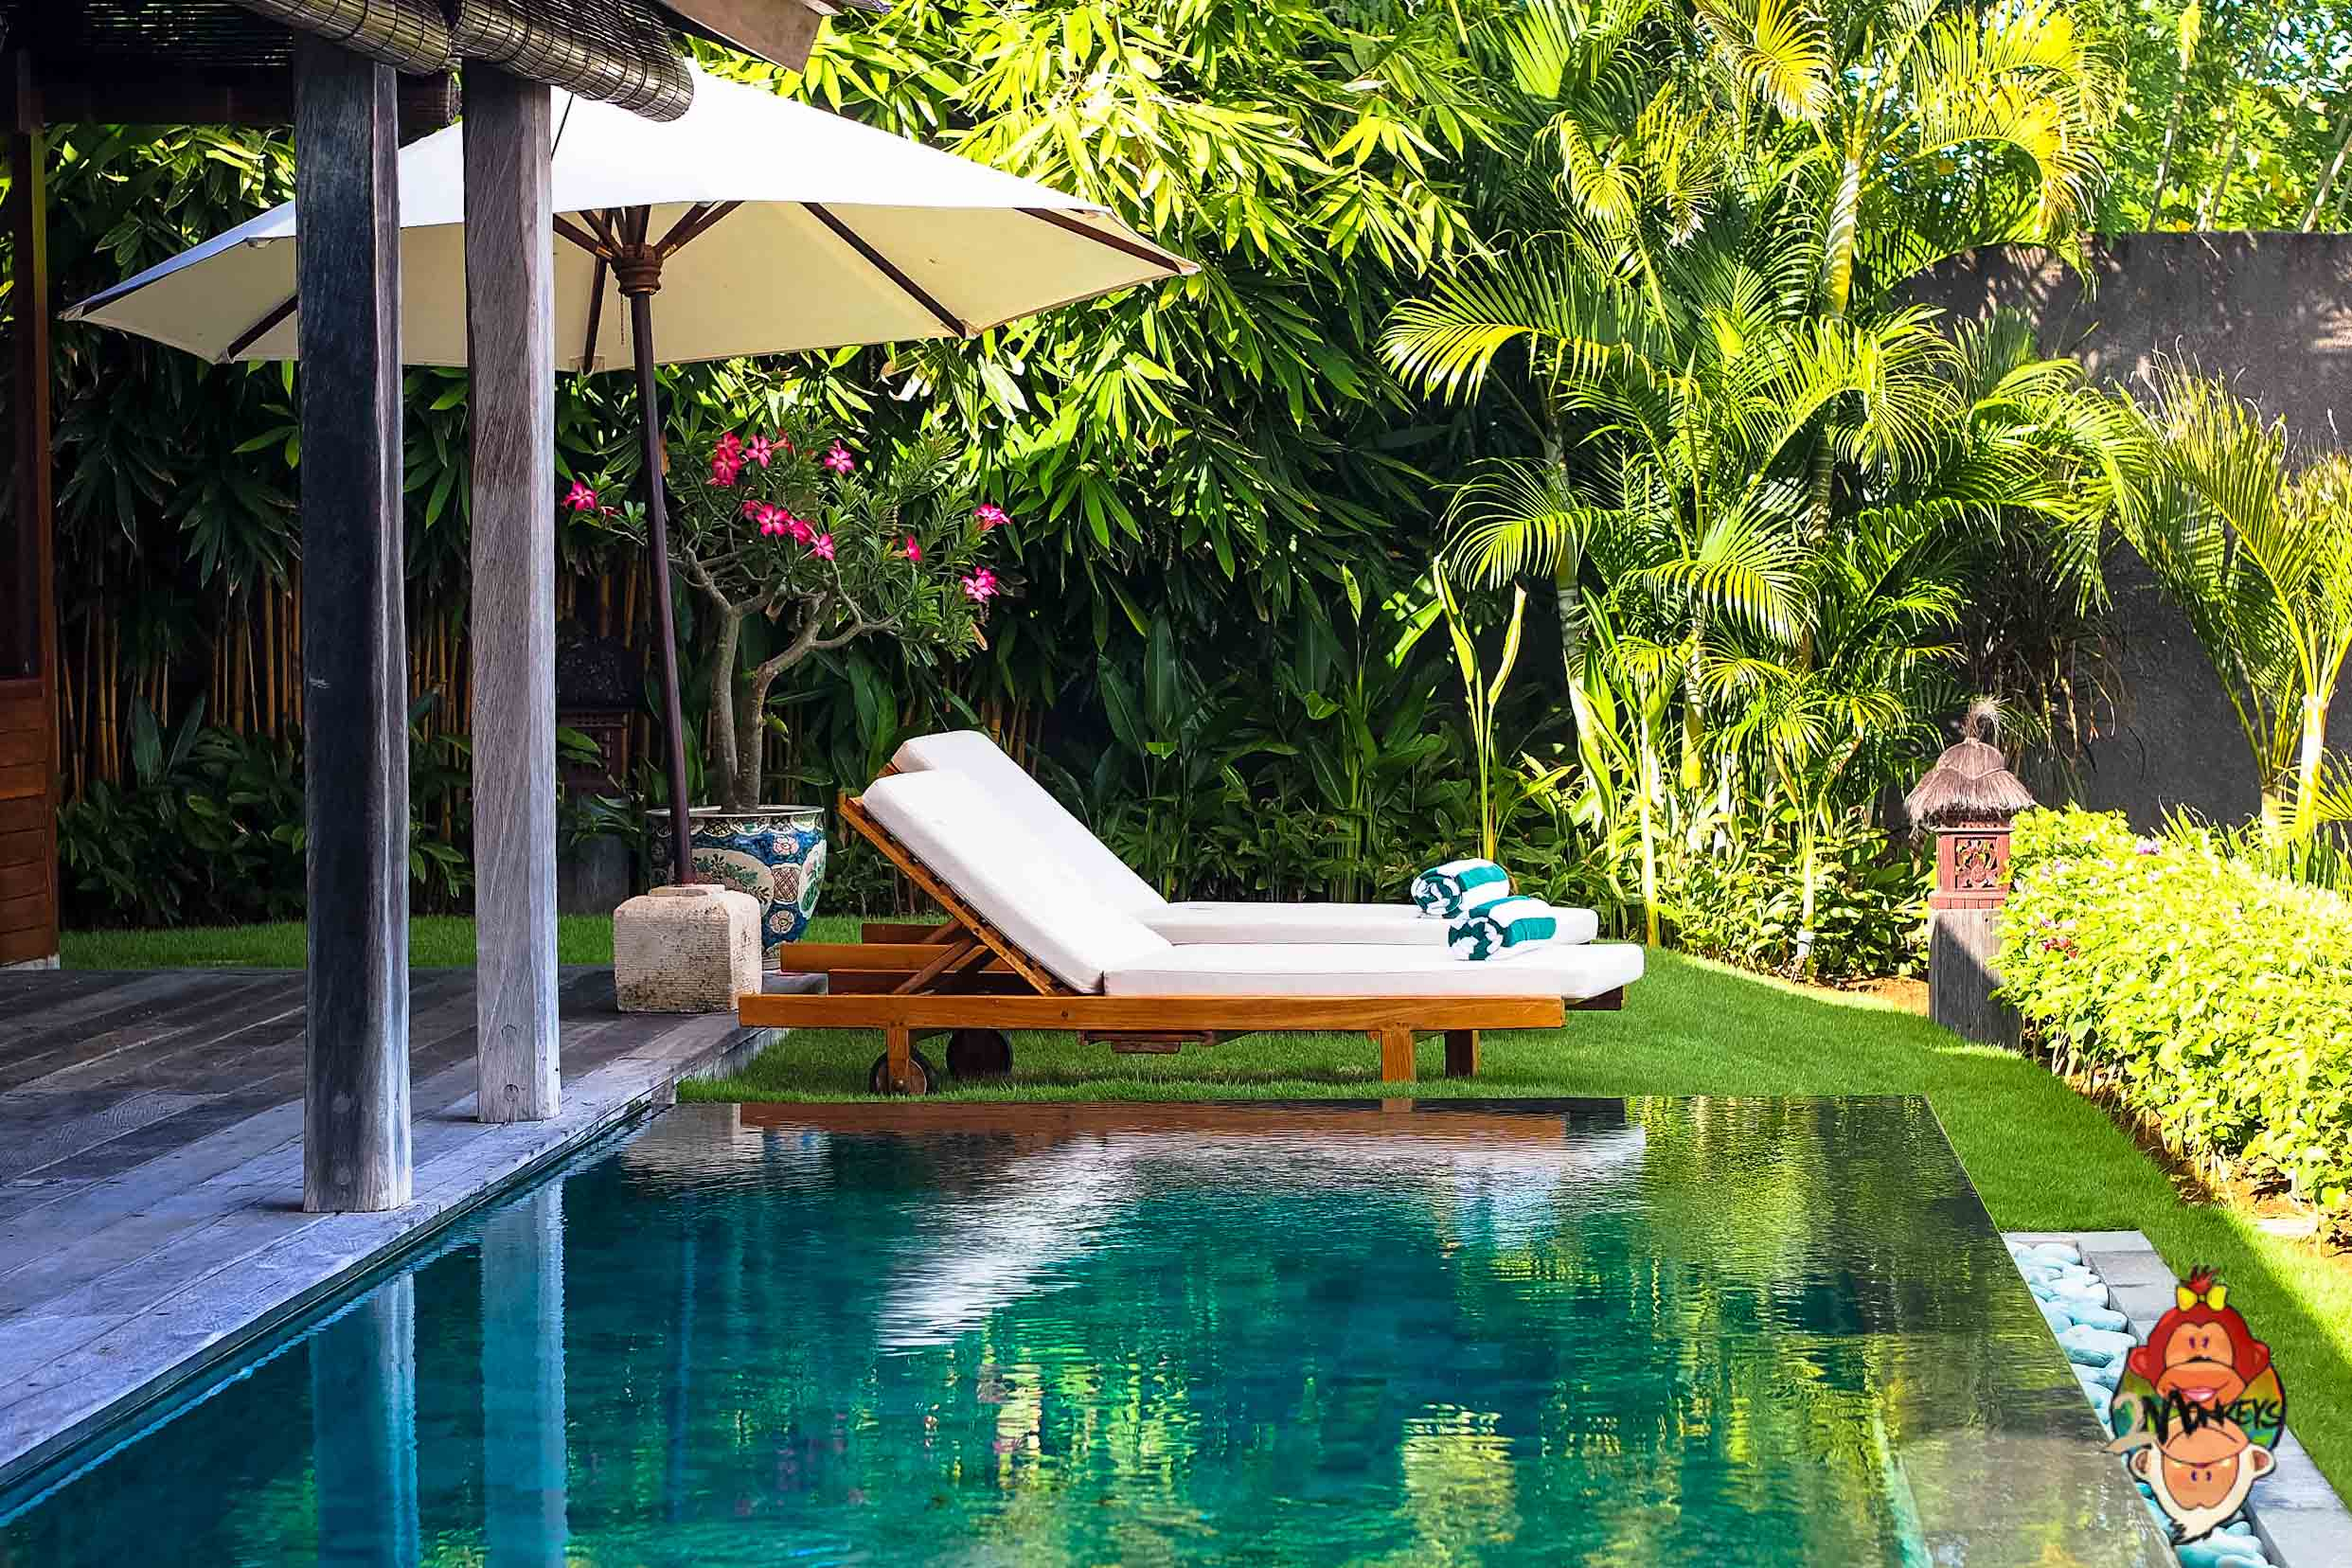 Luxury Hotel Review - Hidden Hills Villas, Bali